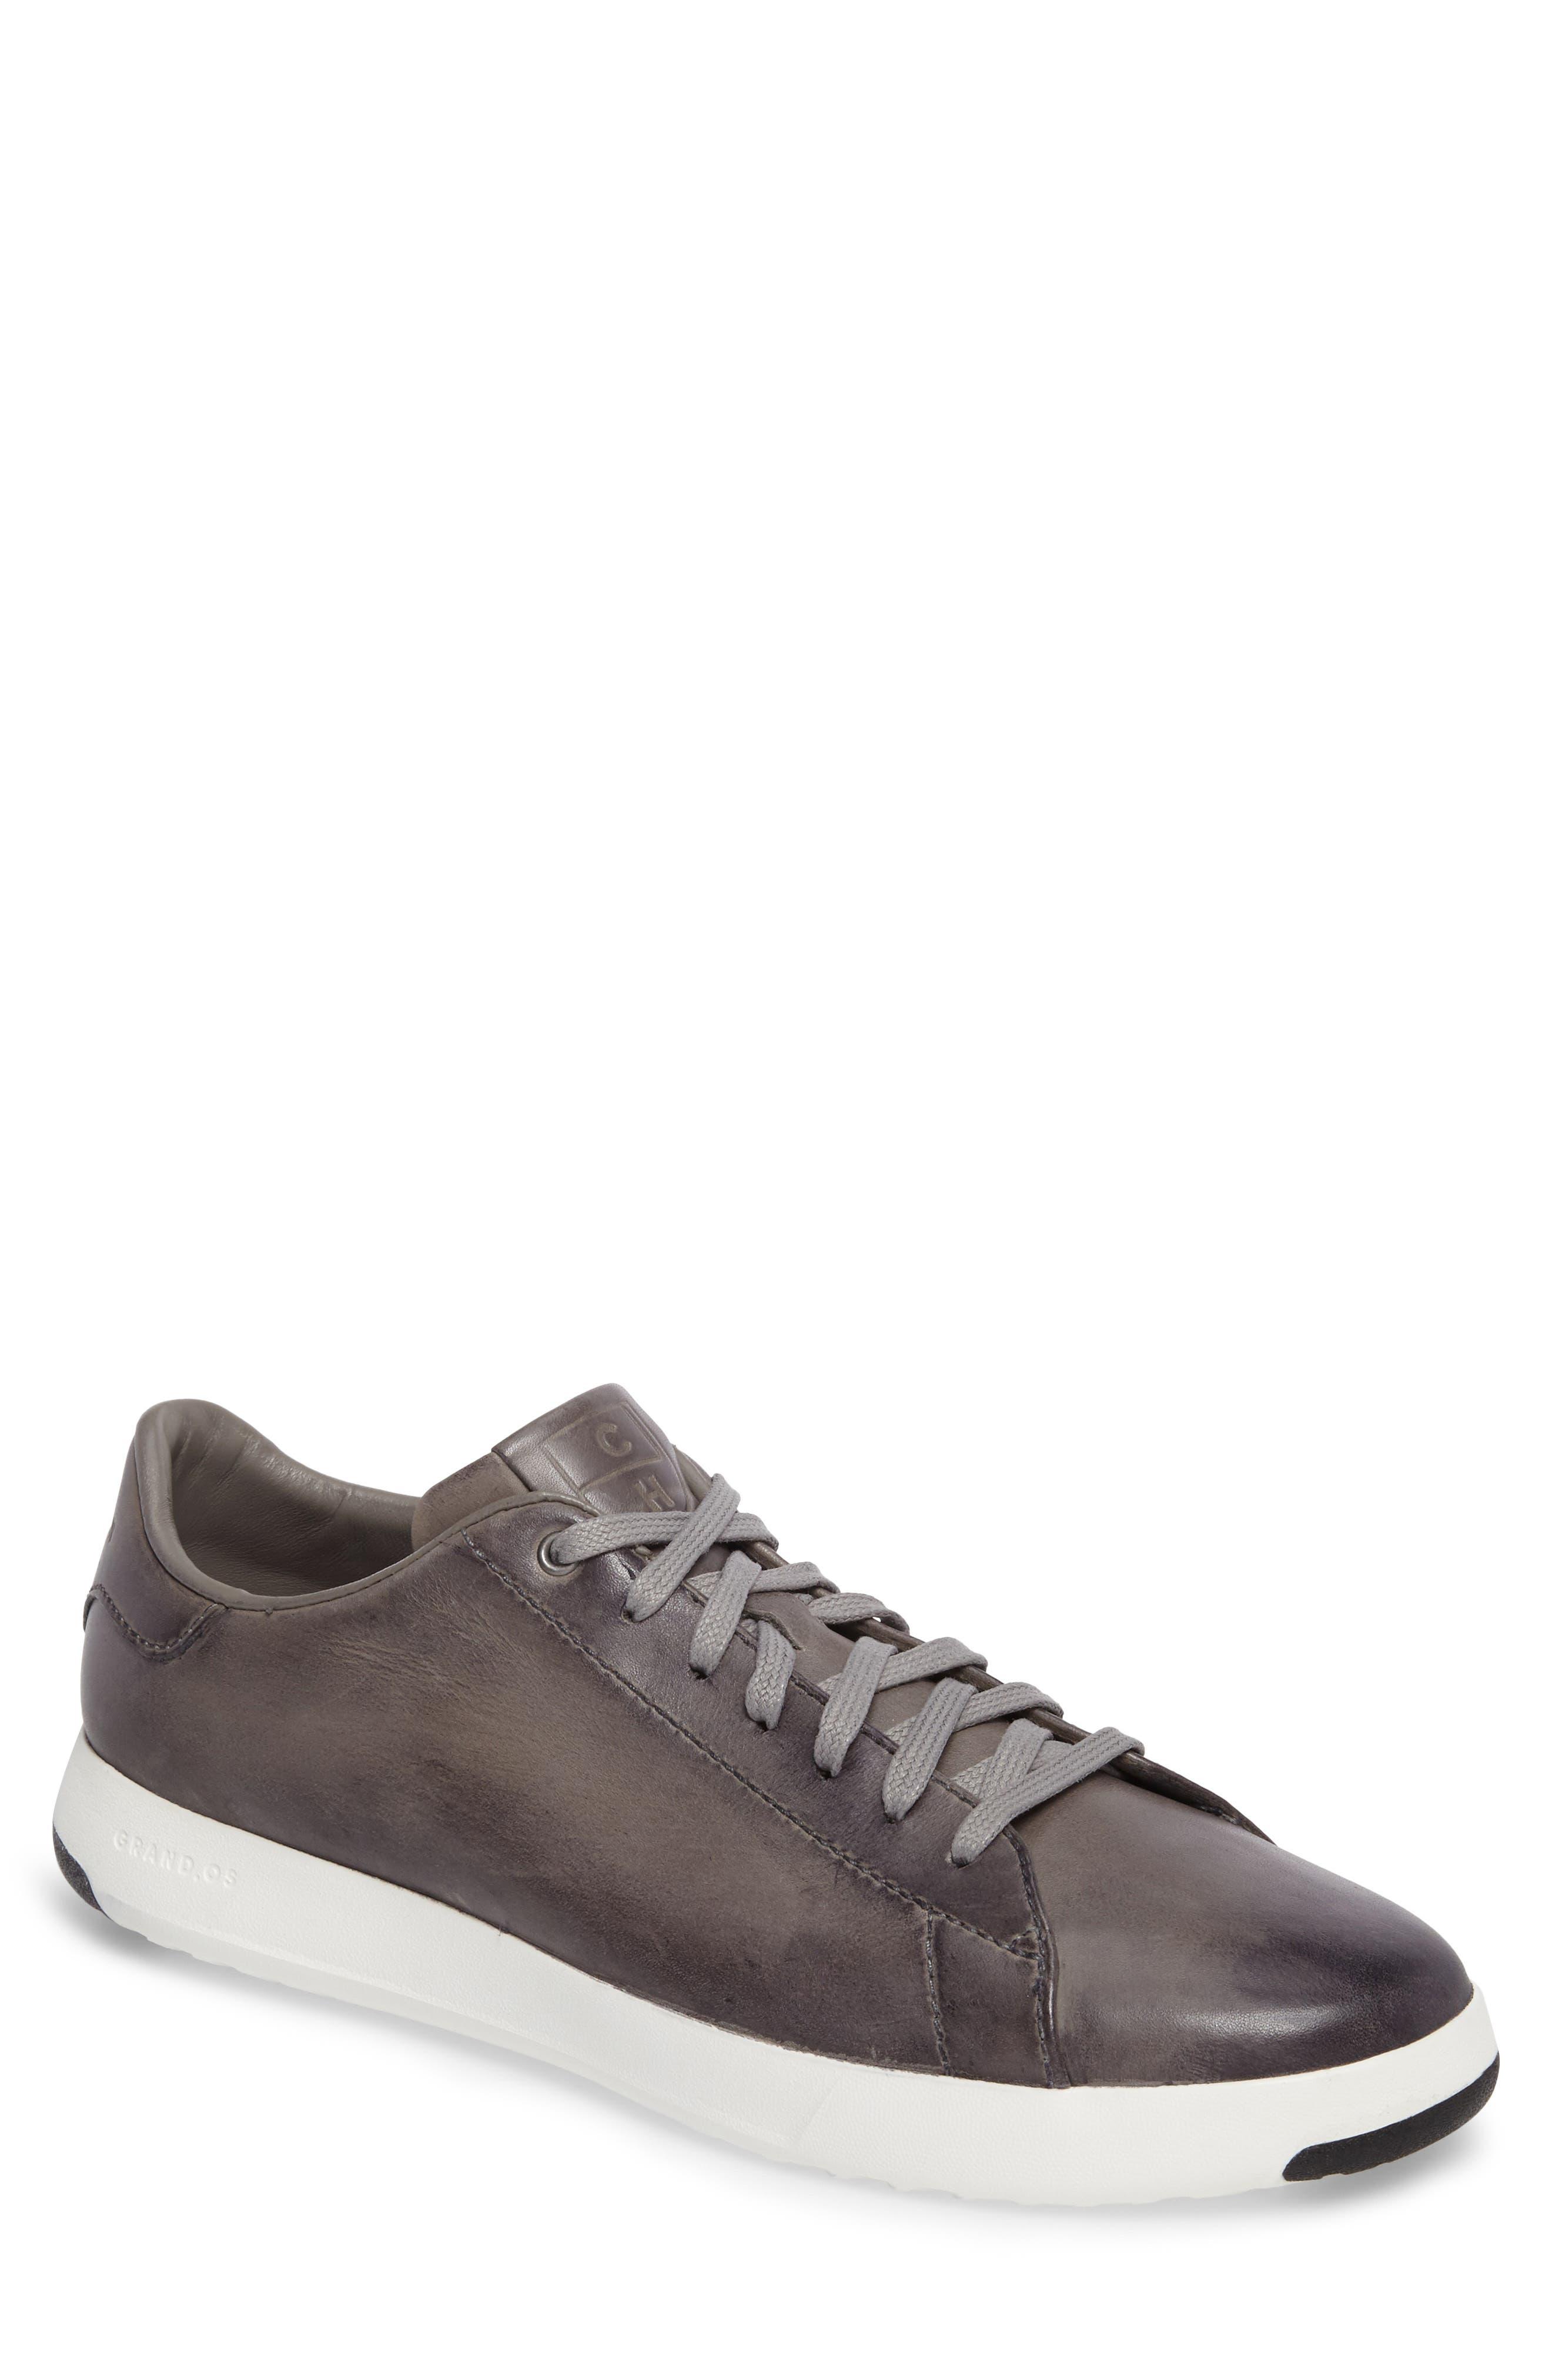 Men's Dress Sneakers